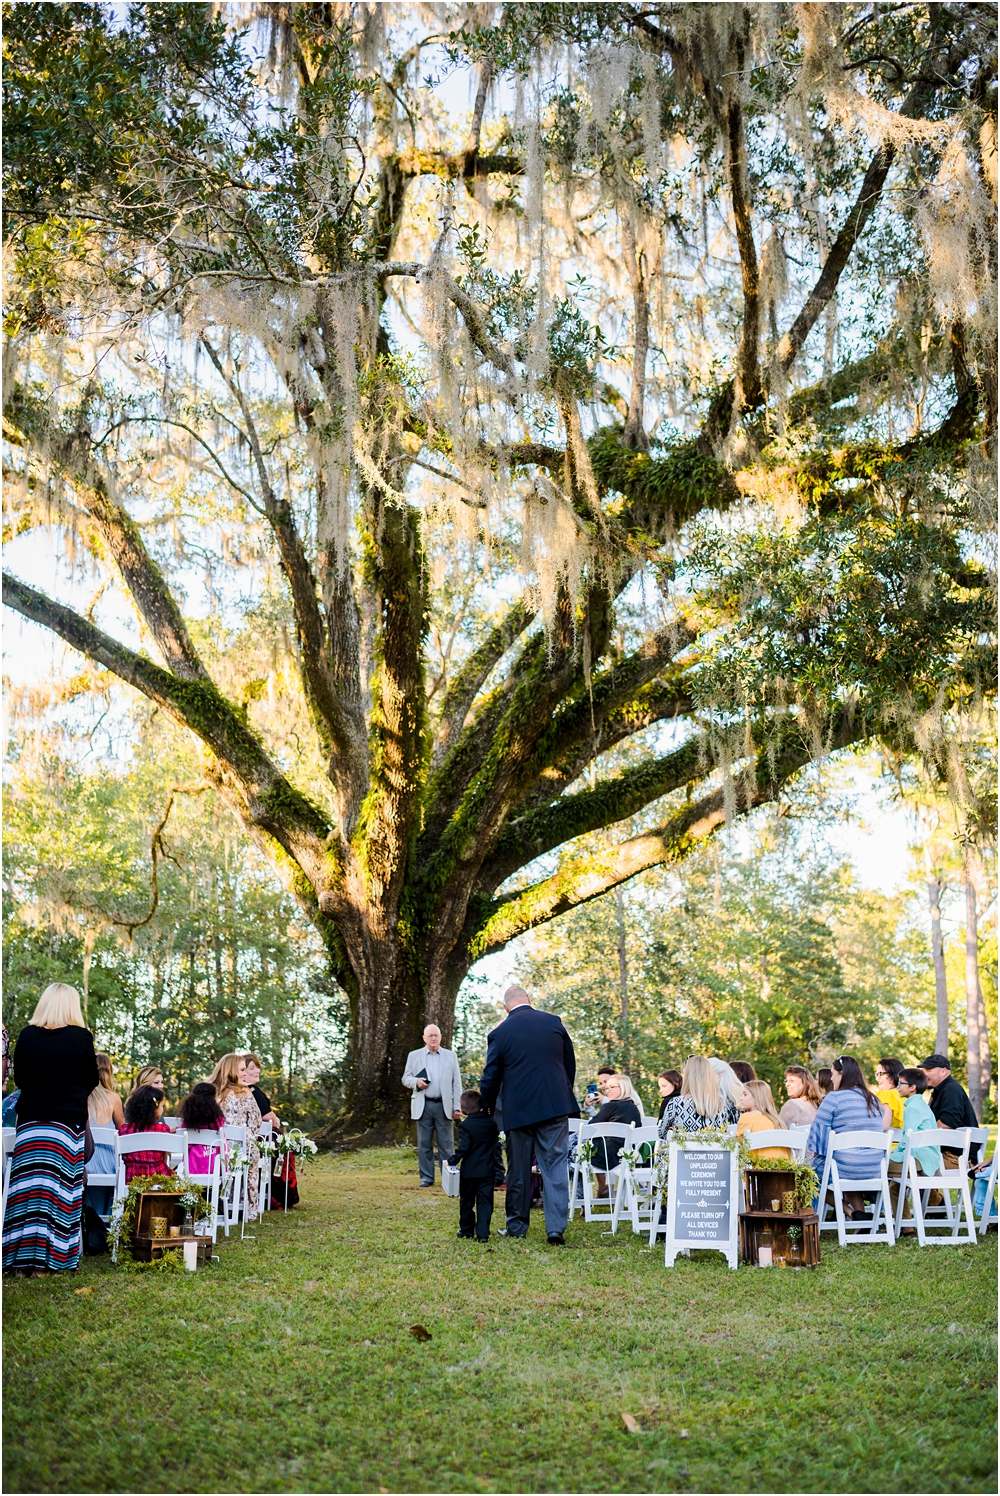 Eden-Gardens-florida-wedding-photographer-kiersten-stevenson-photography-47.jpg